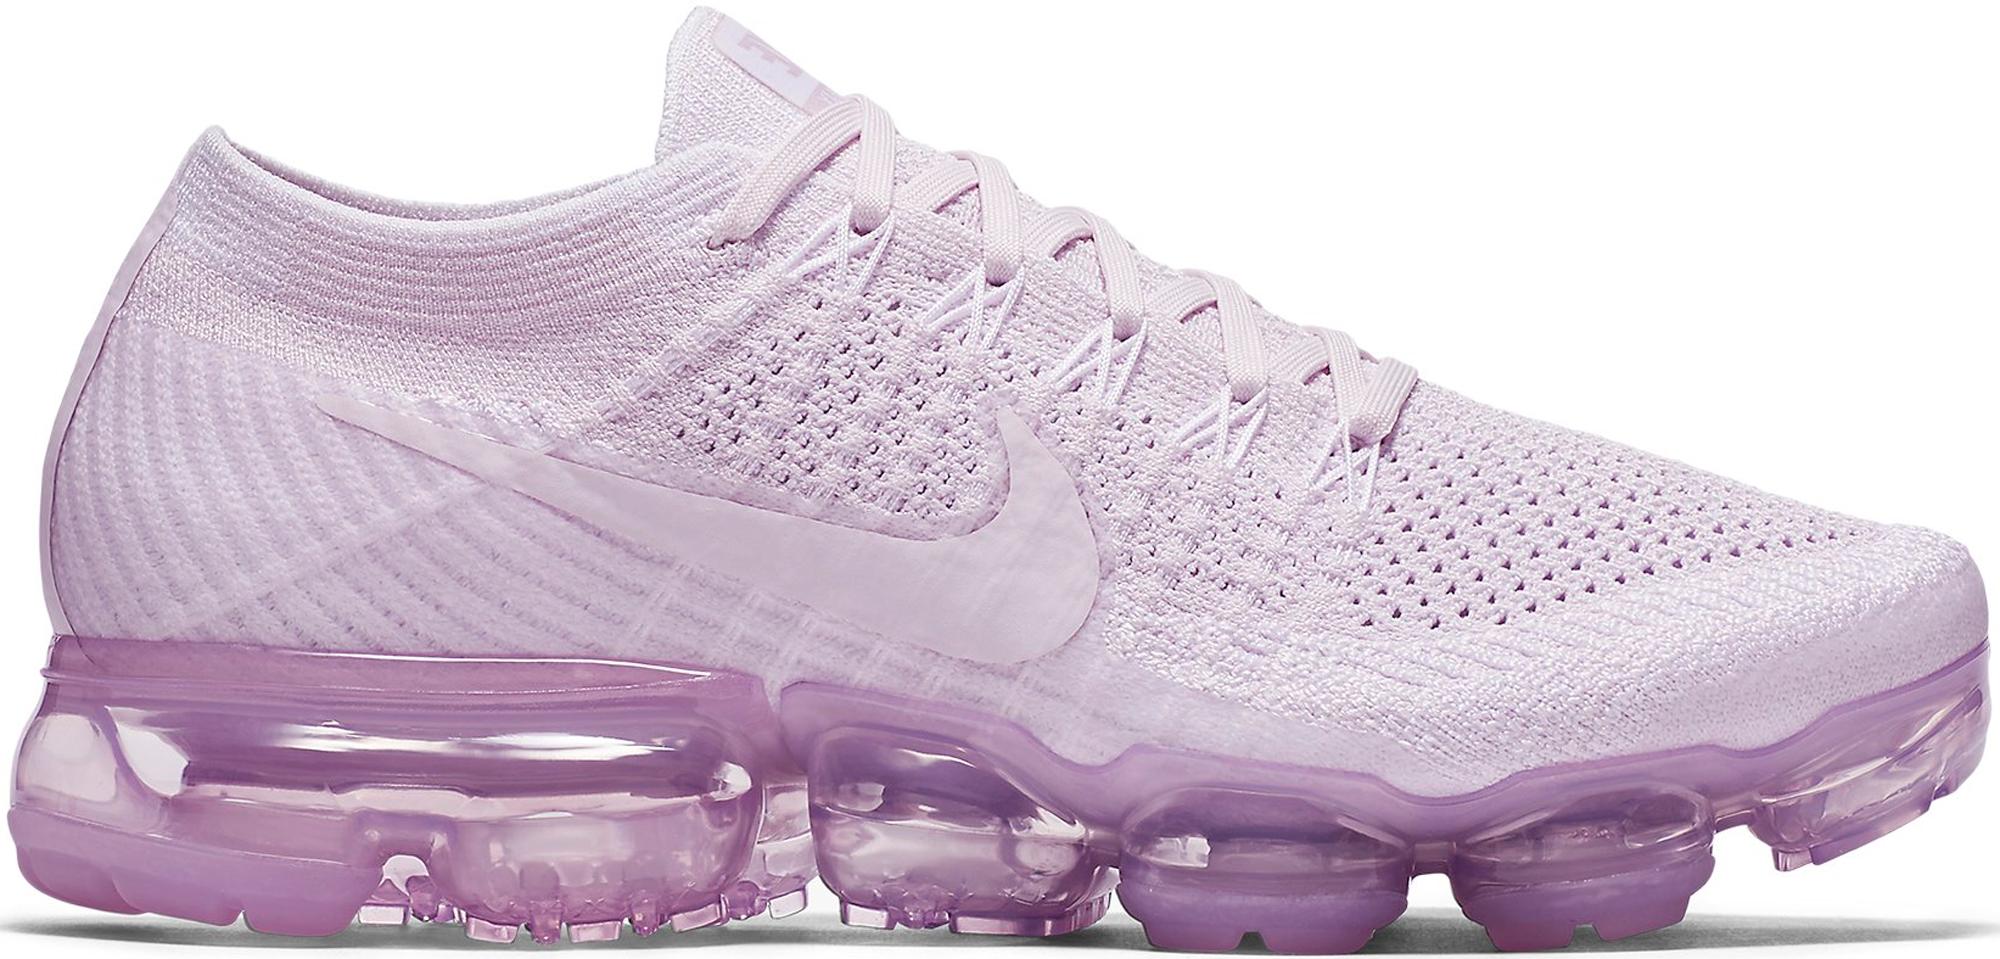 22ff70b91b40c Nike Vapormax Womens Light Violet where to buy cheap jordans online